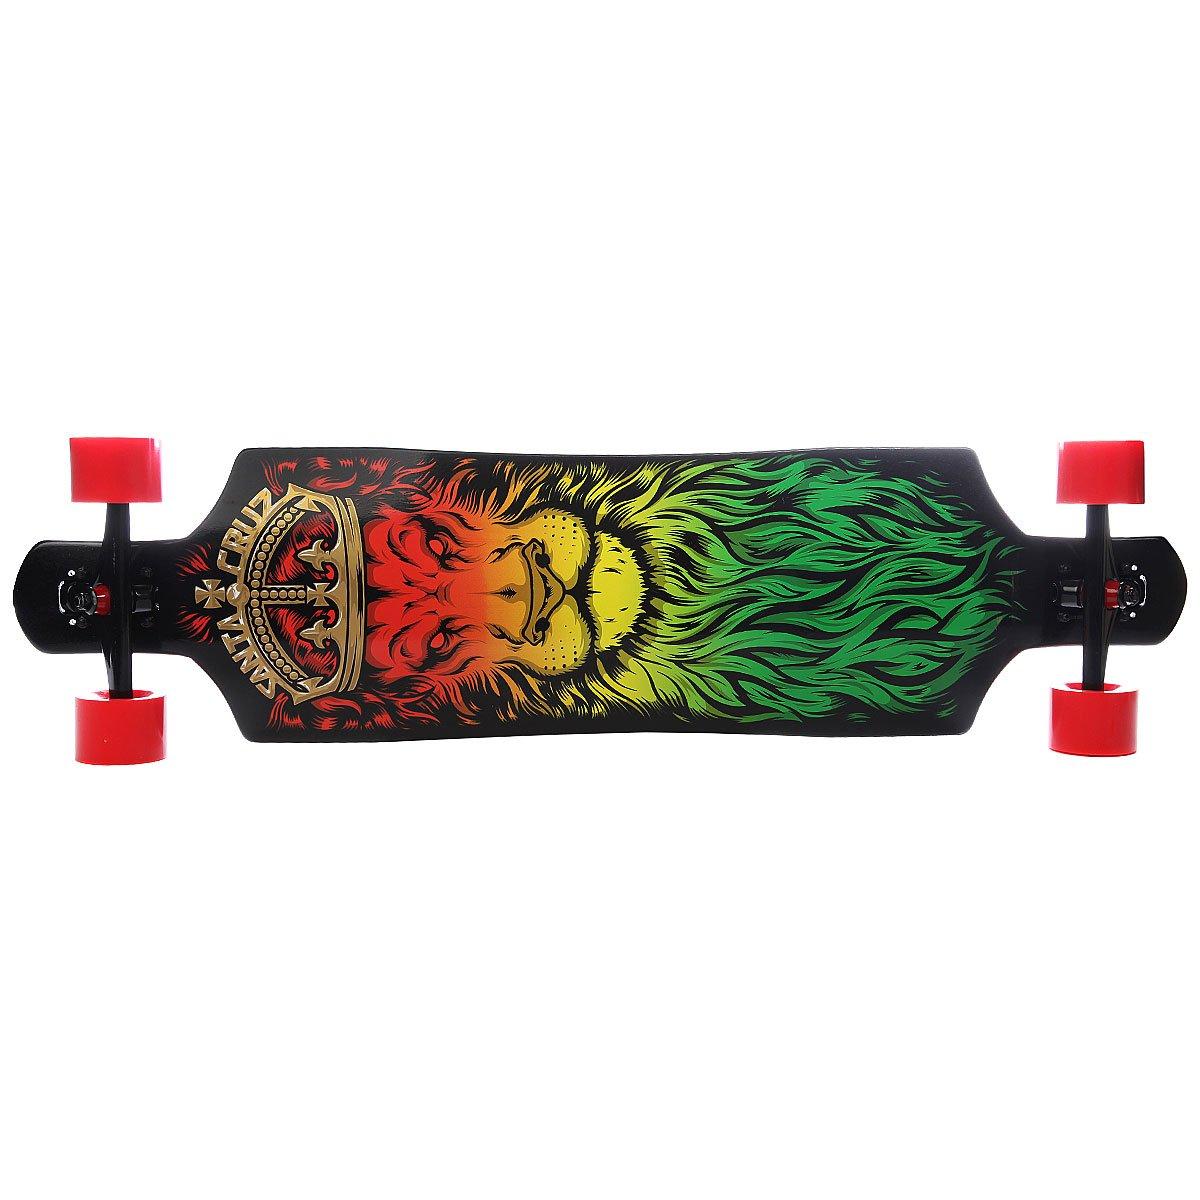 Лонгборд Santa Cruz Lion God Drop Thru Cruzer Black/Yellow/Red/Green 10 X 40 (101.6 см)